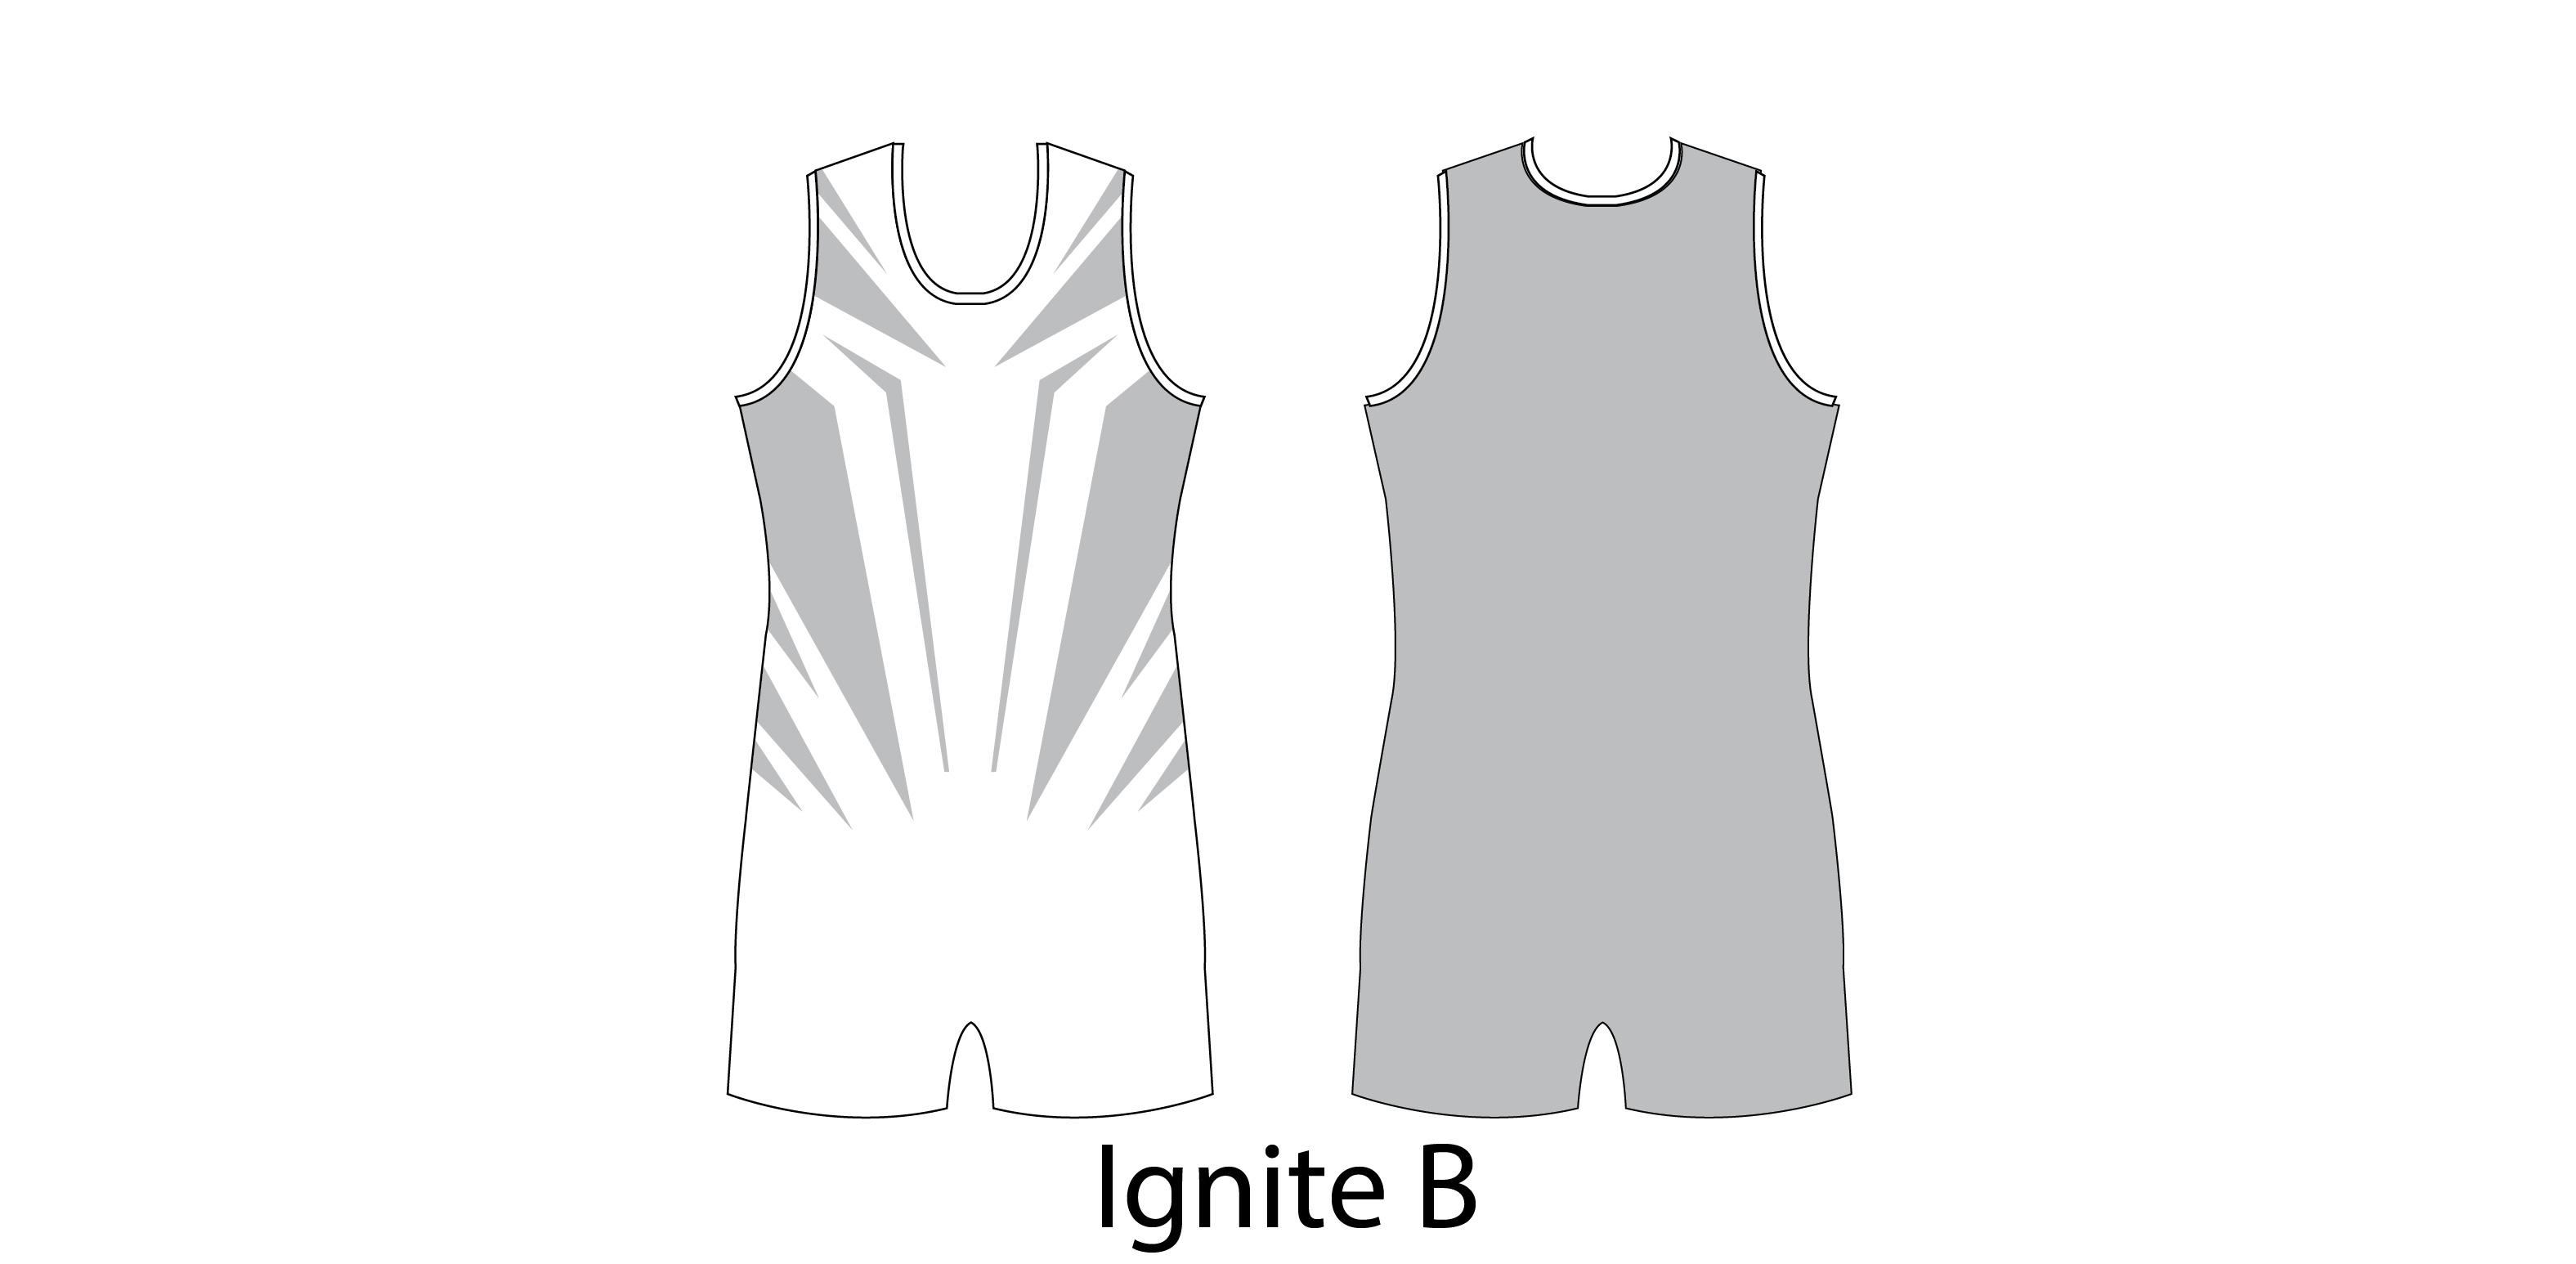 Ignite B